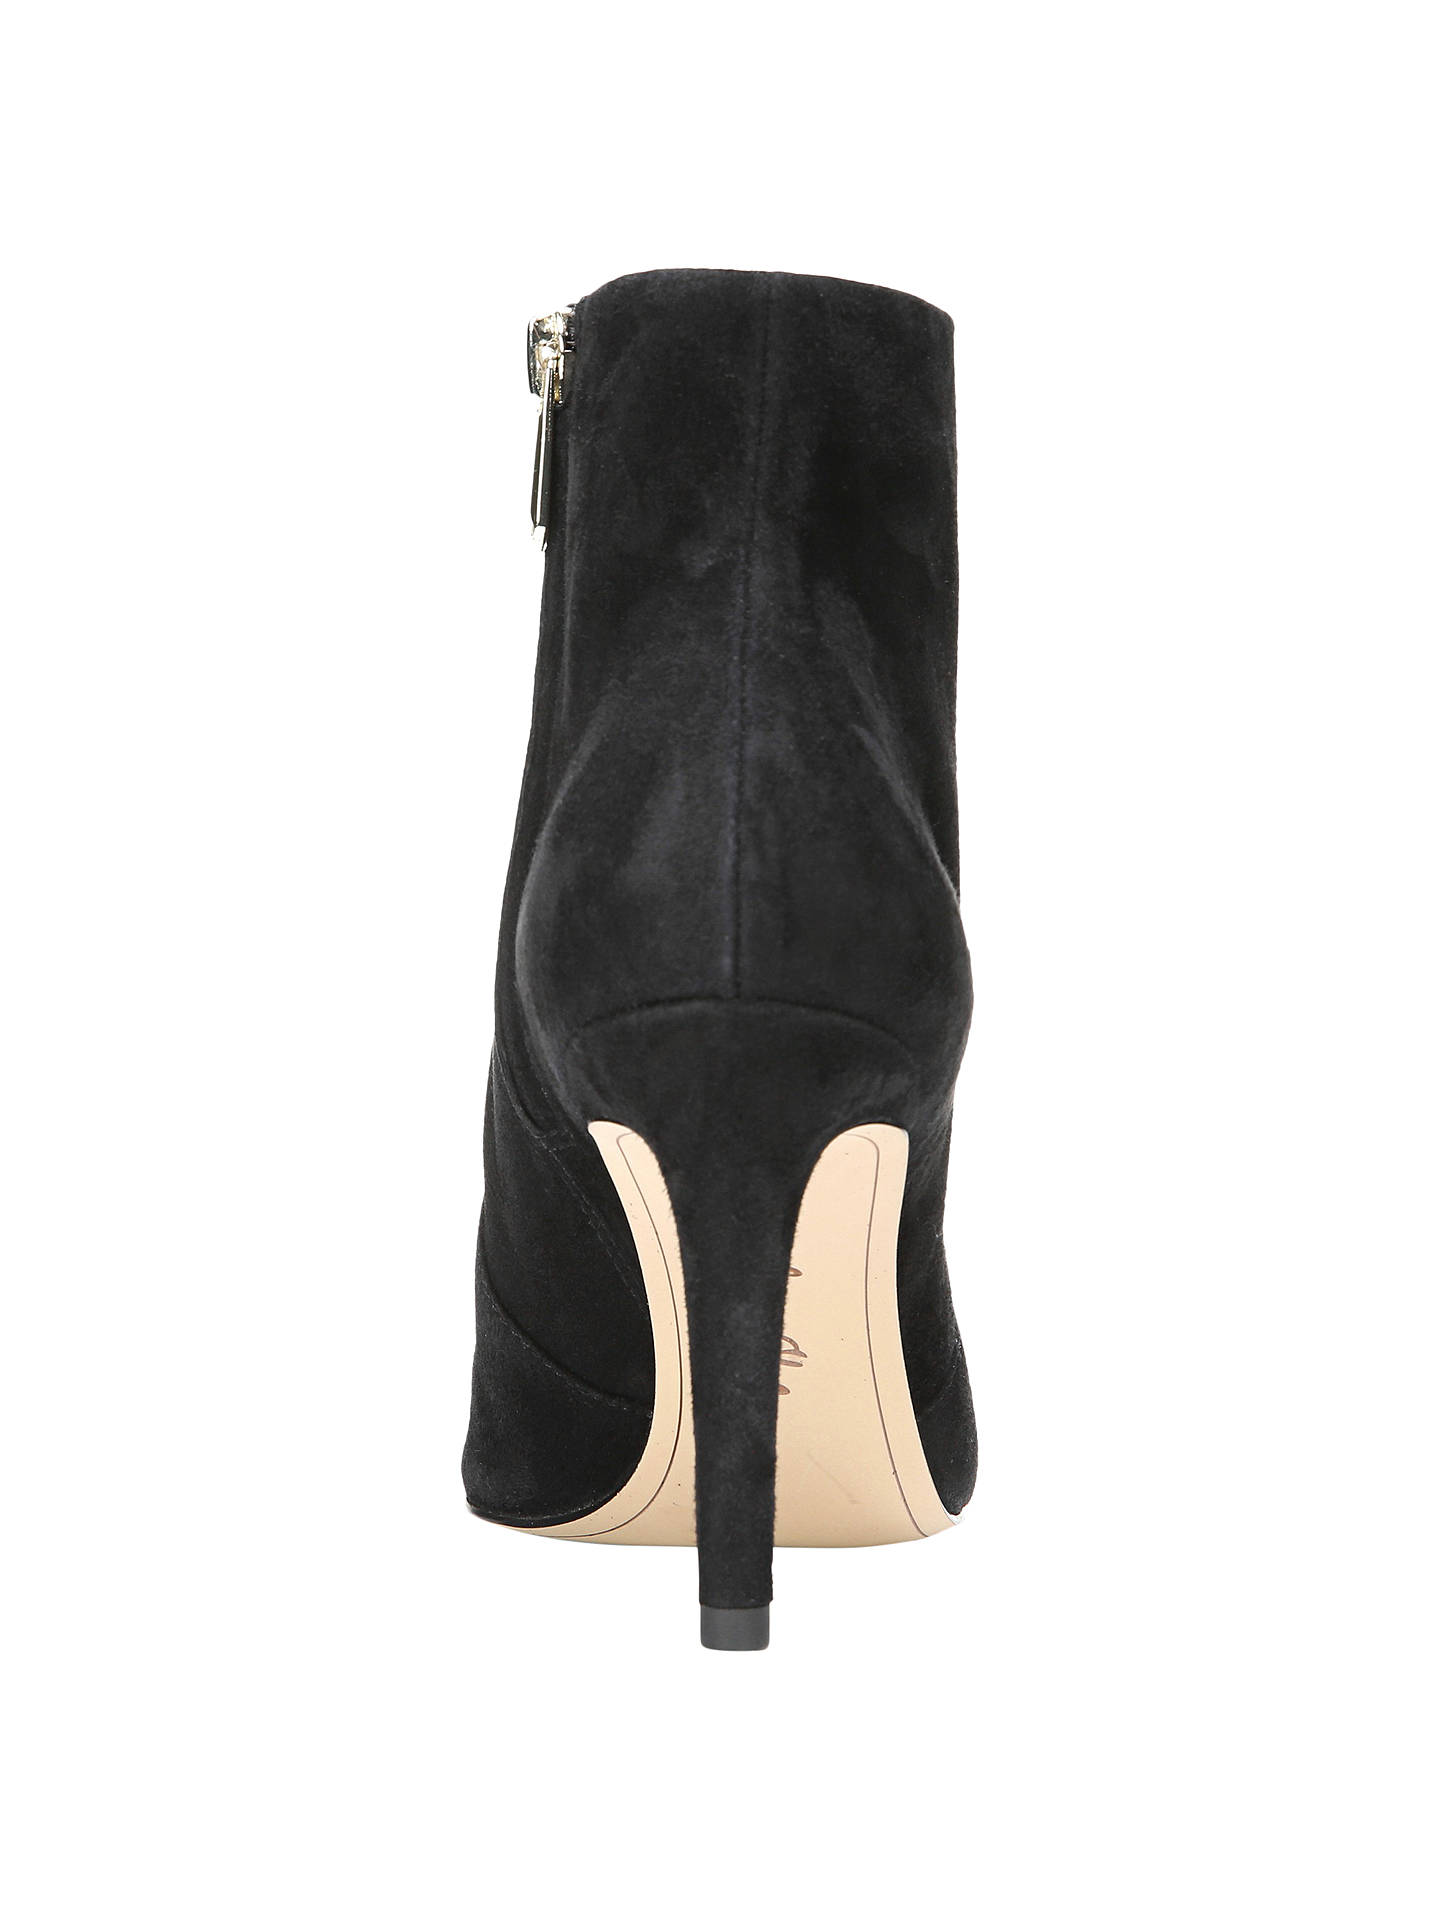 48e56617494369 Buy Sam Edelman Olette Stiletto Heeled Ankle Boots